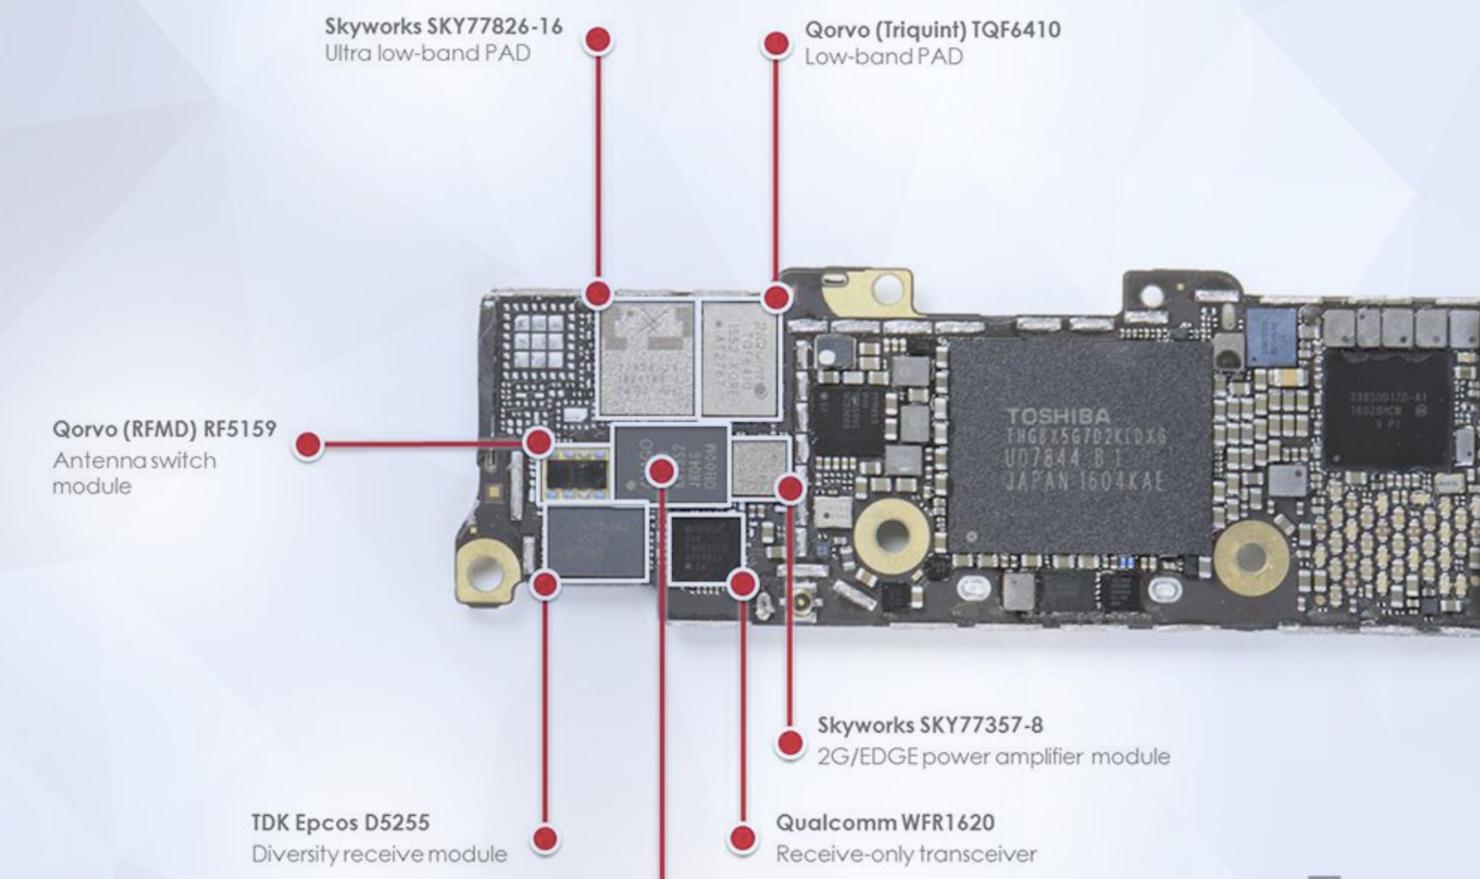 iPhone SE teardown showing components